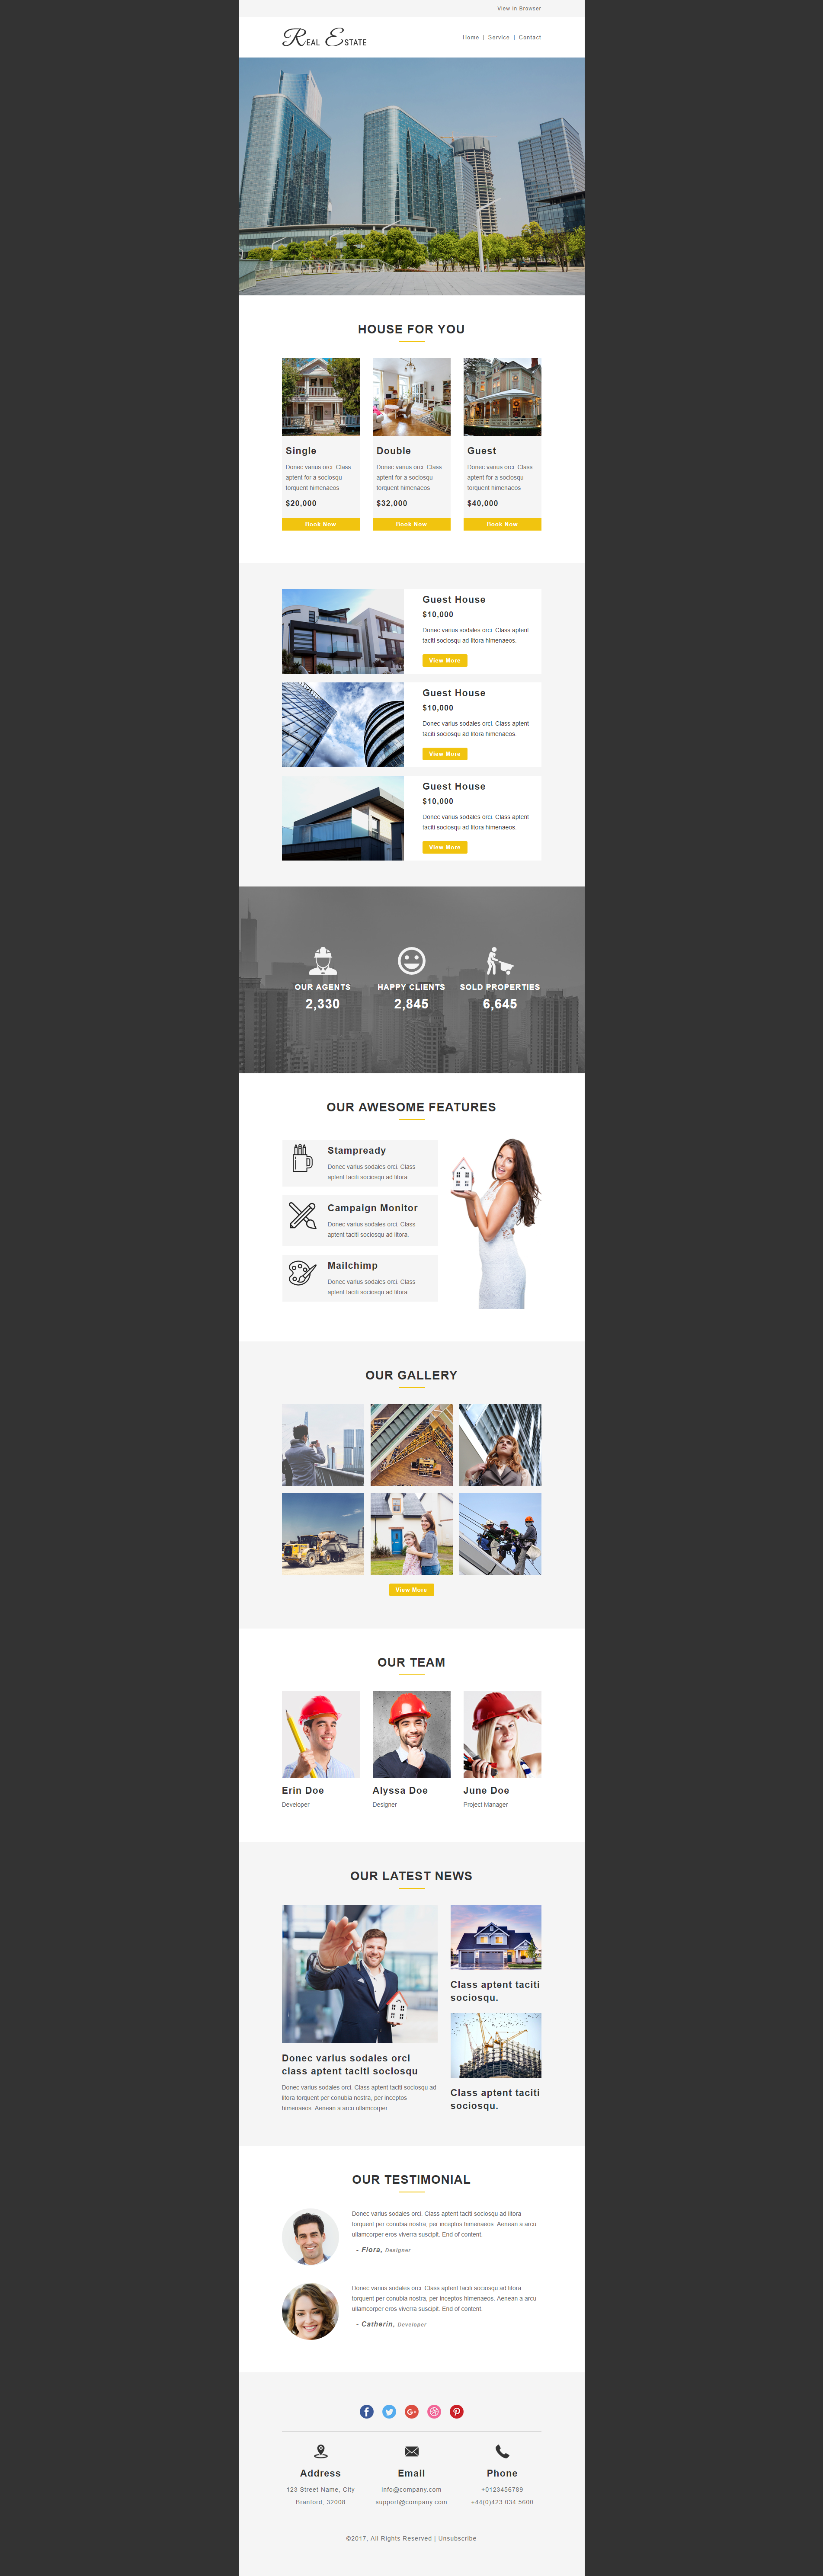 webexpert_007 : I will design email template,html newsletter,html ...